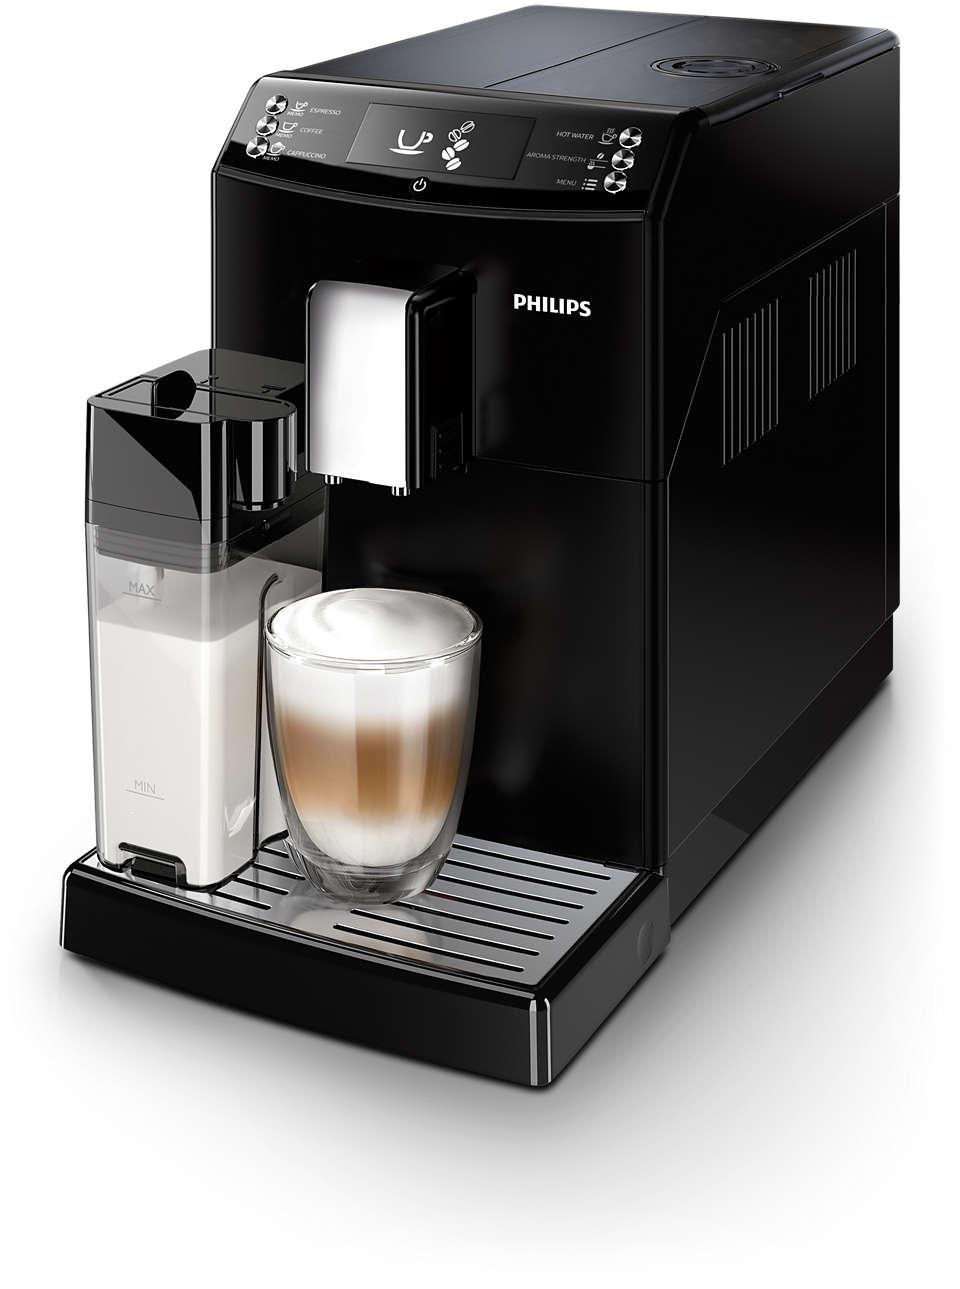 Espresso et cappuccino à la simple pression d'un bouton